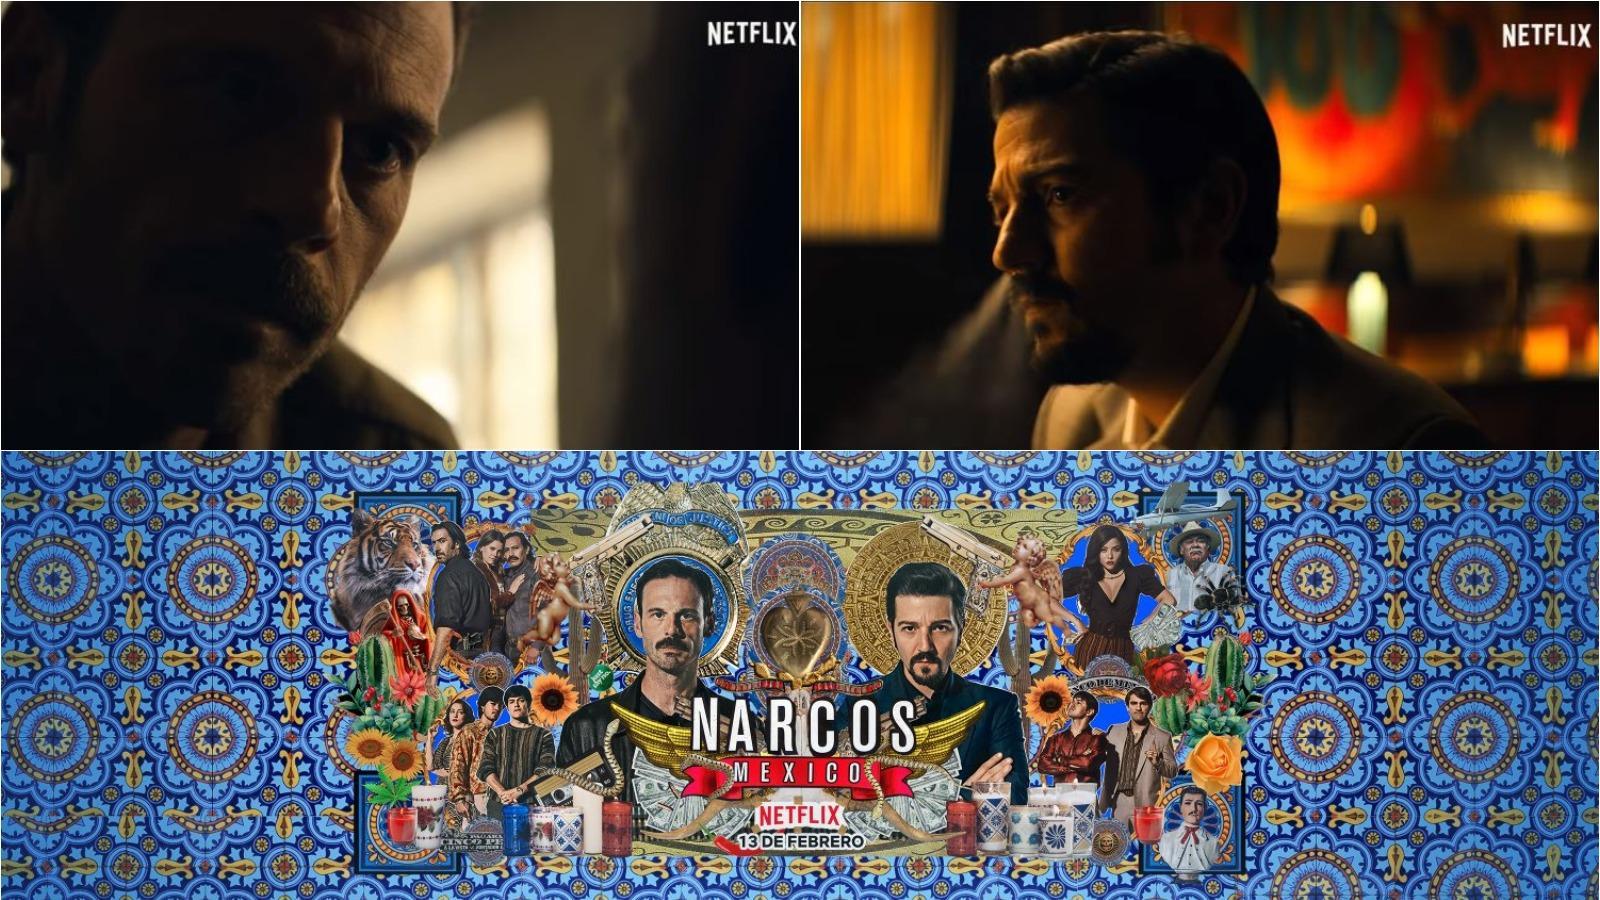 Narcos: Mexico Season 2 Wallpapers